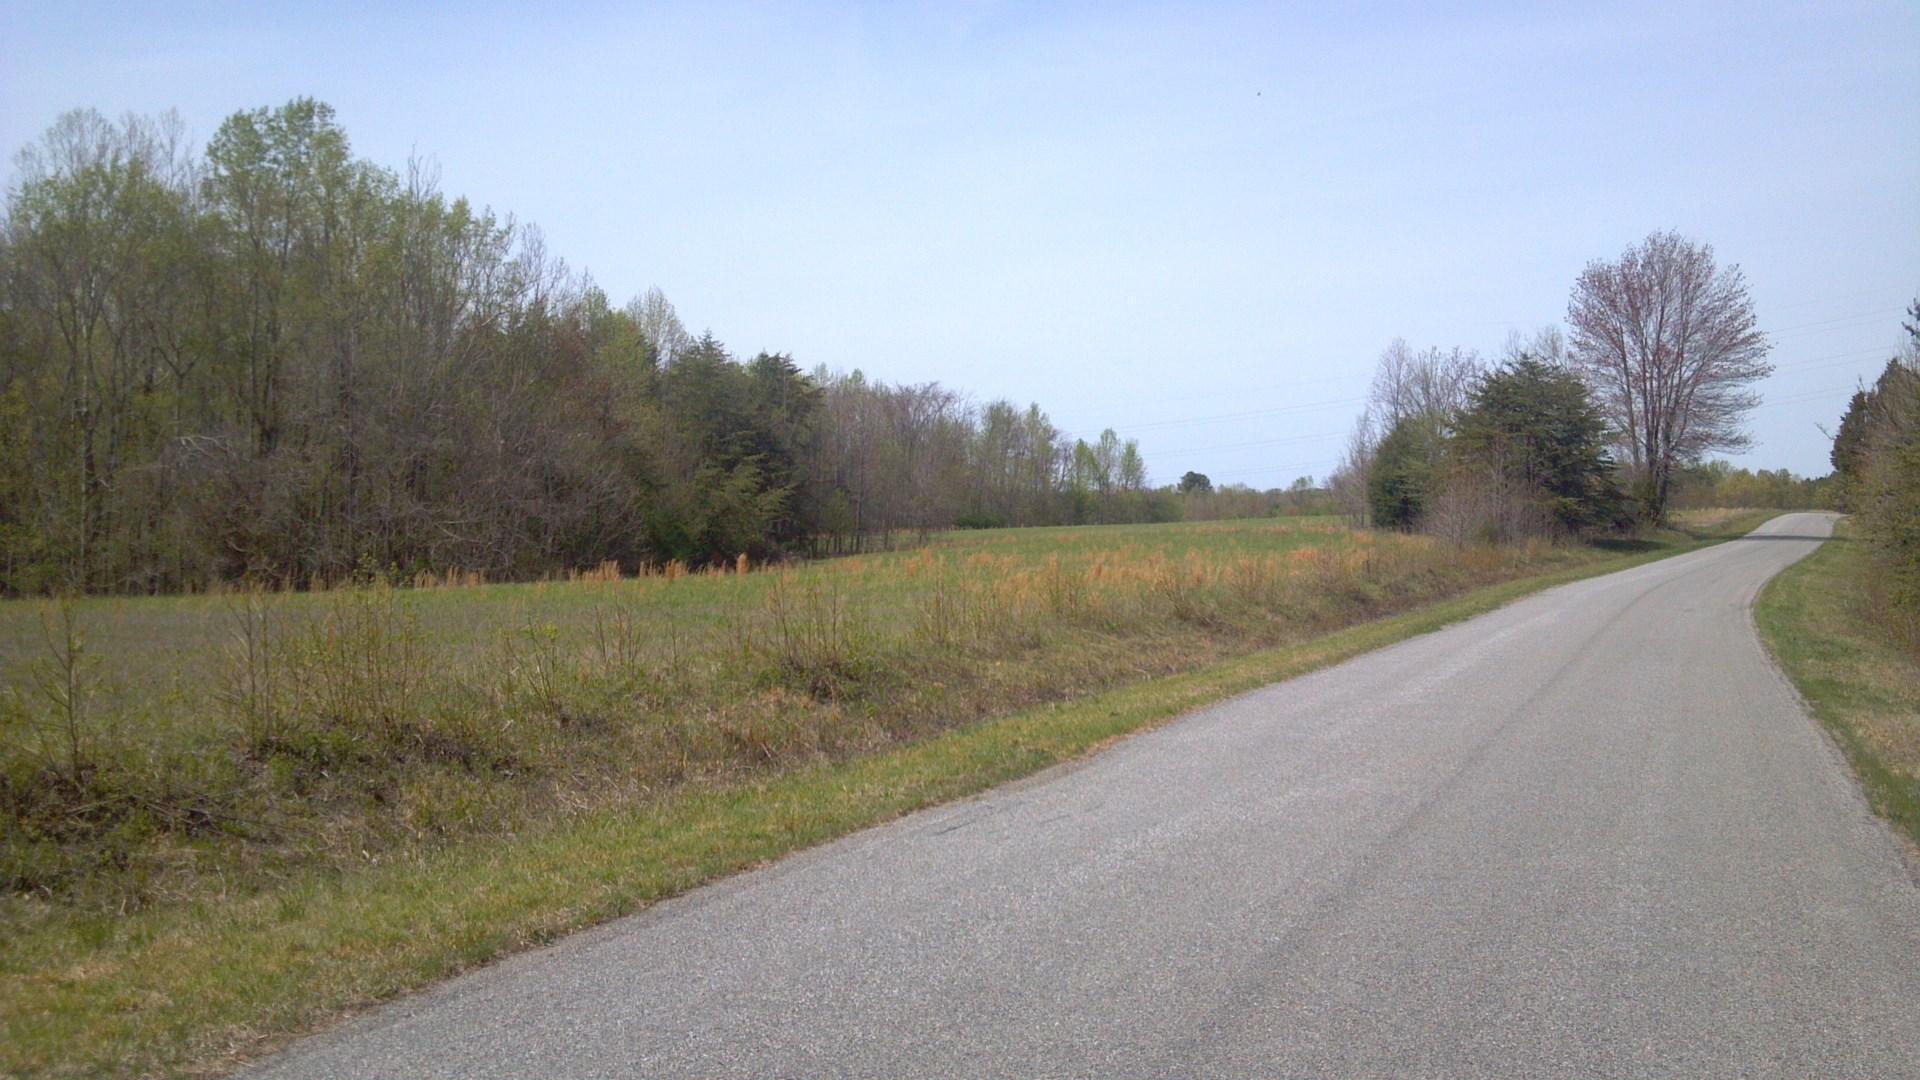 Long road frontage in Danville Va